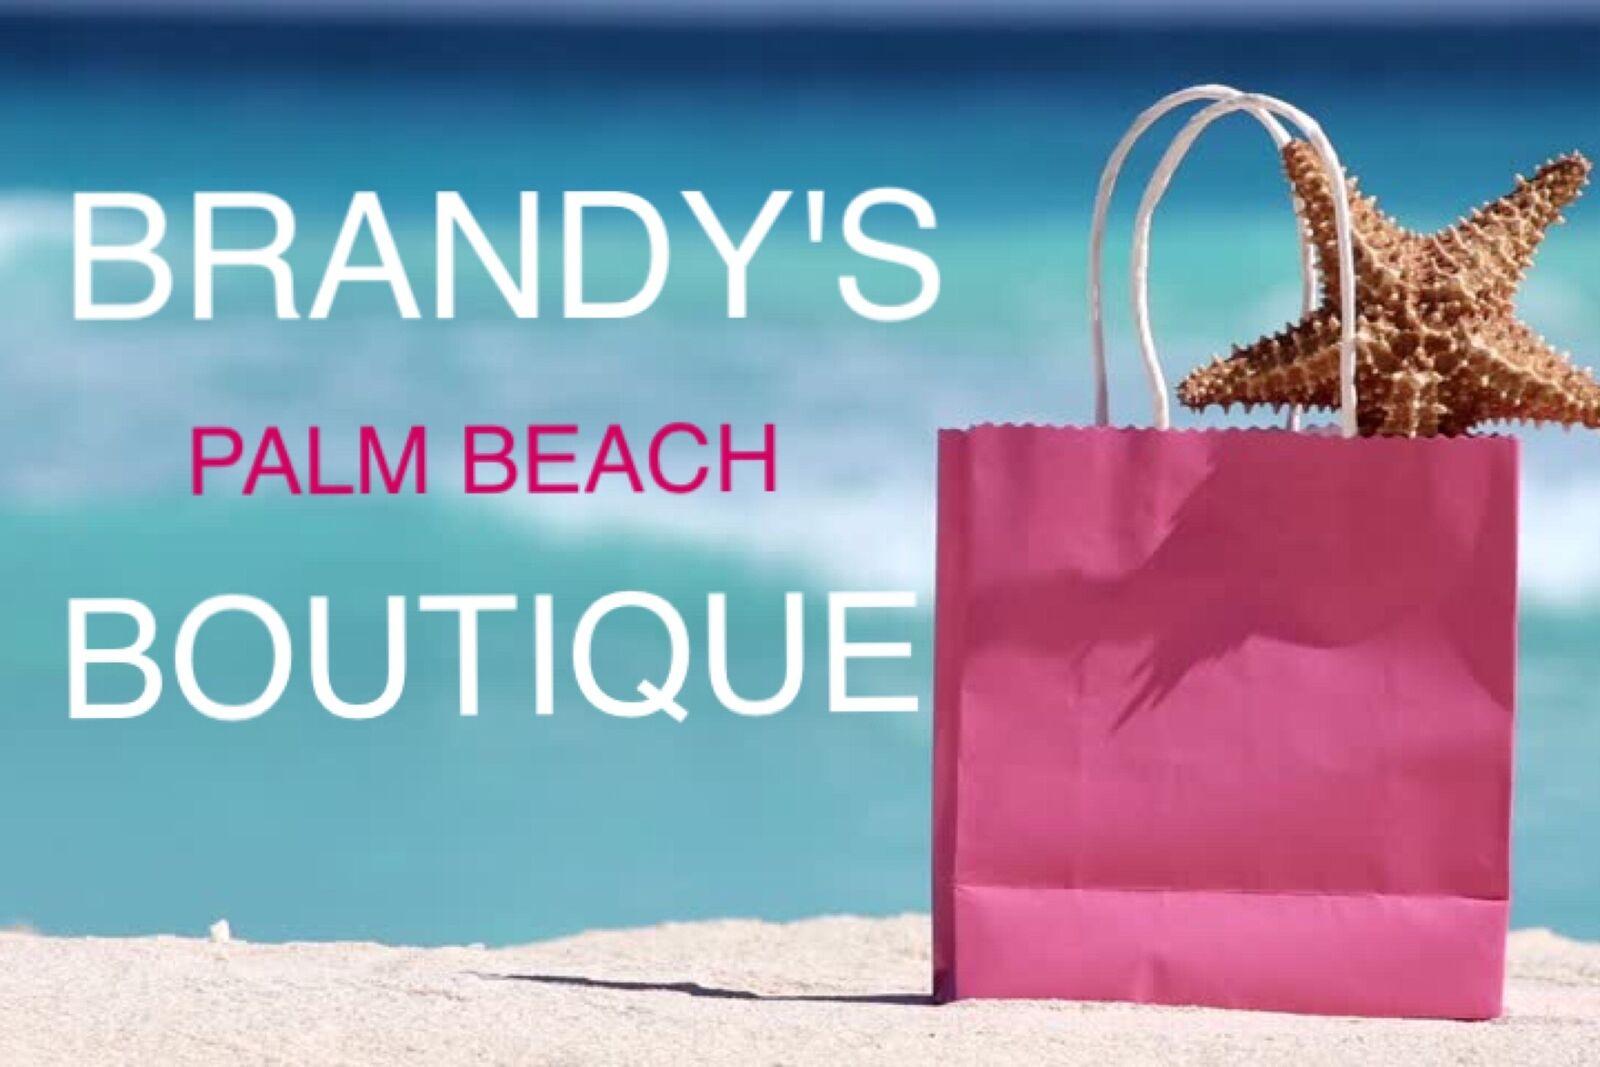 BRANDYS PALM BEACH BOUTIQUE